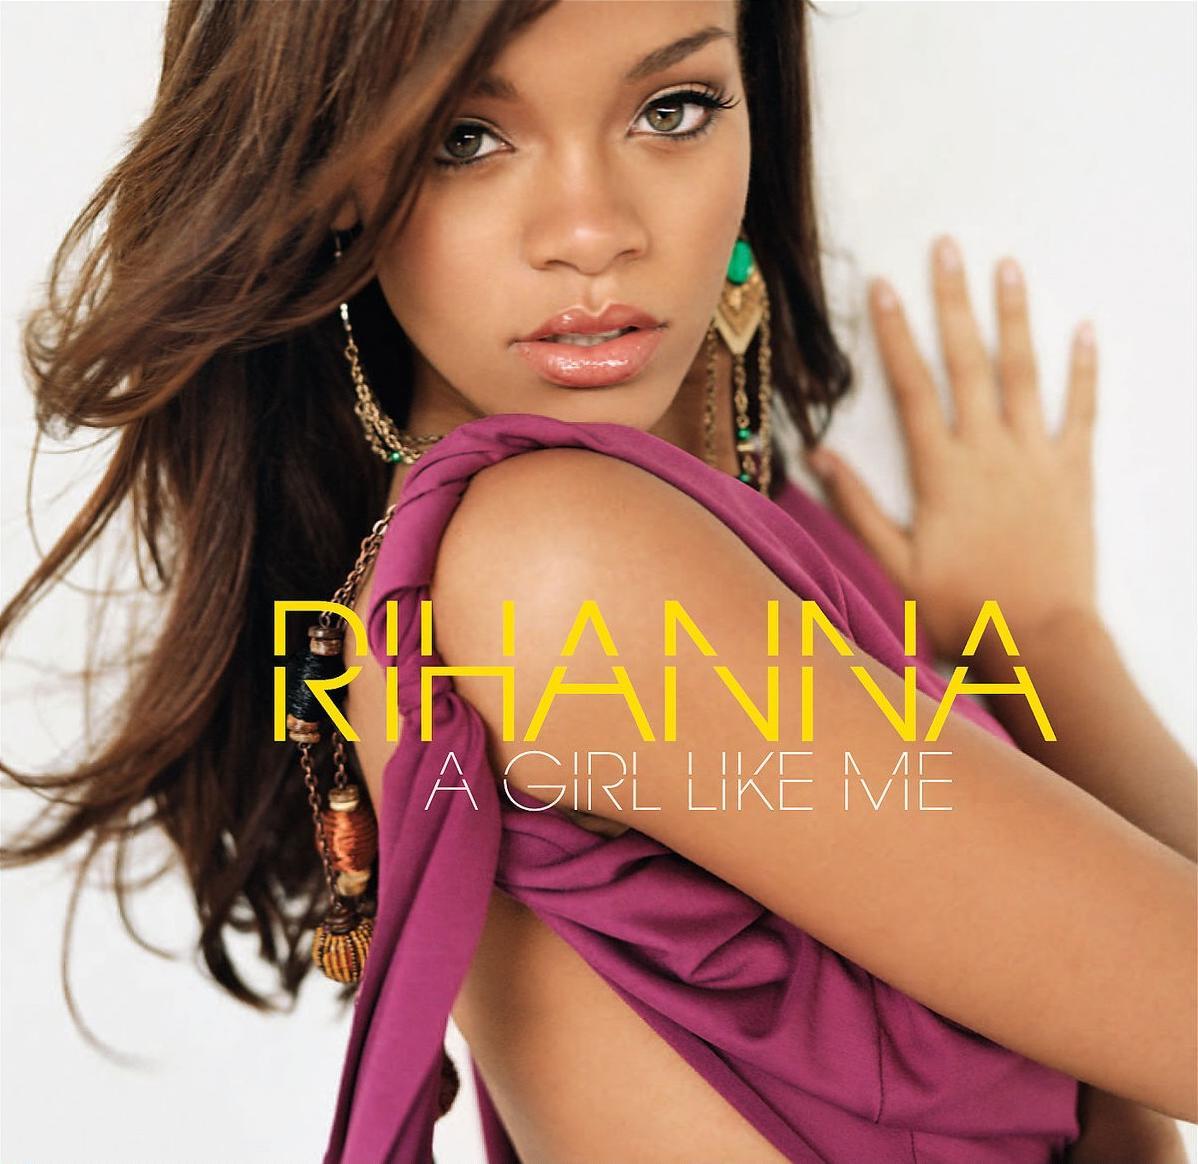 http://2.bp.blogspot.com/-q9vhvr5l-sM/TWZ36evWvkI/AAAAAAAAAA4/db16650EunU/s1600/Rihanna.jpg